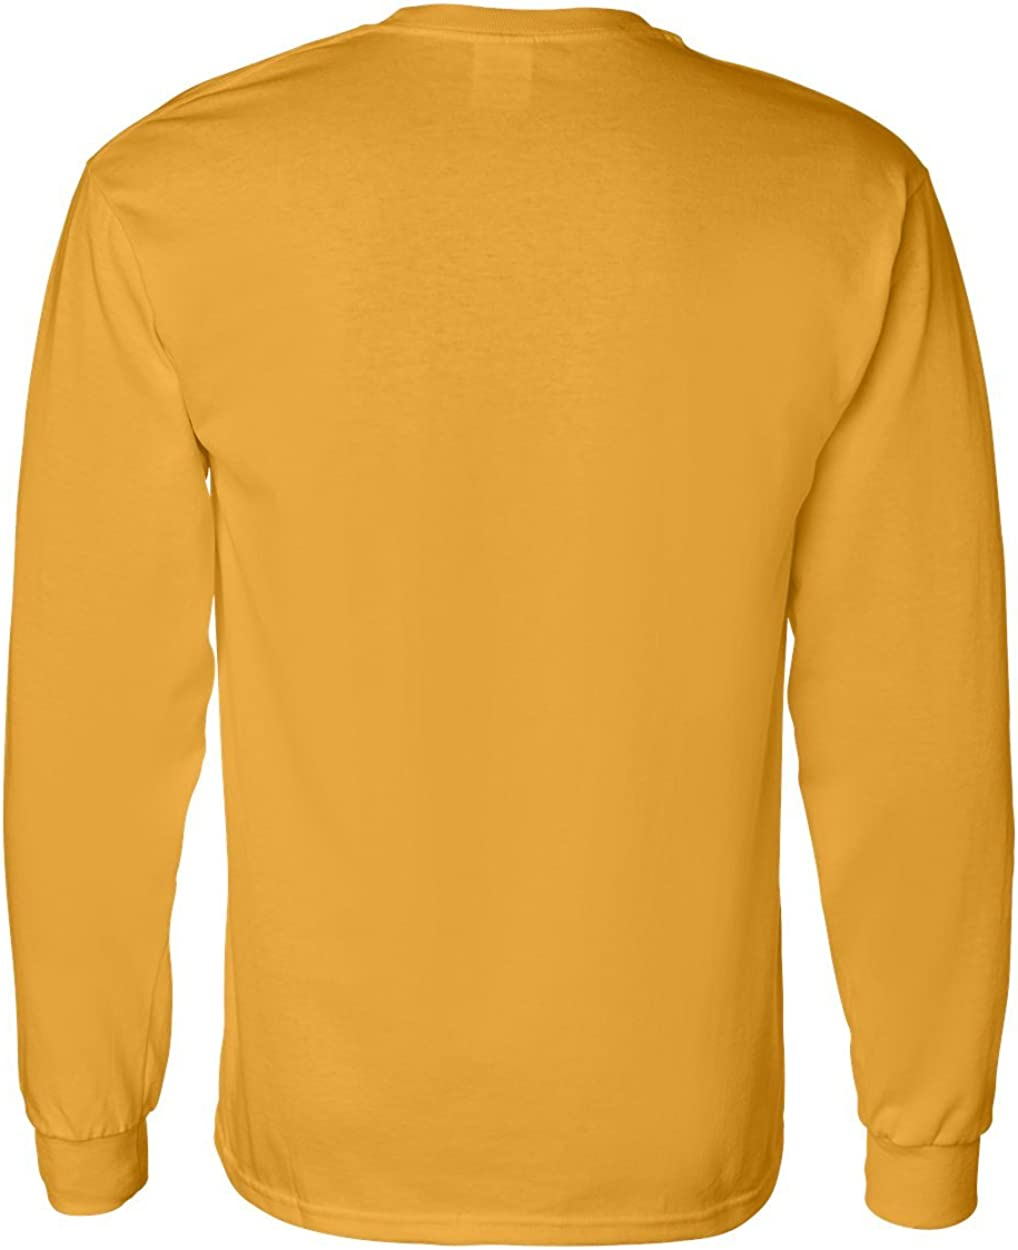 XXL Men/'s Ultra Cotton Gildan Long Sleeve T-SHIRT Charcoal blank plain tee S